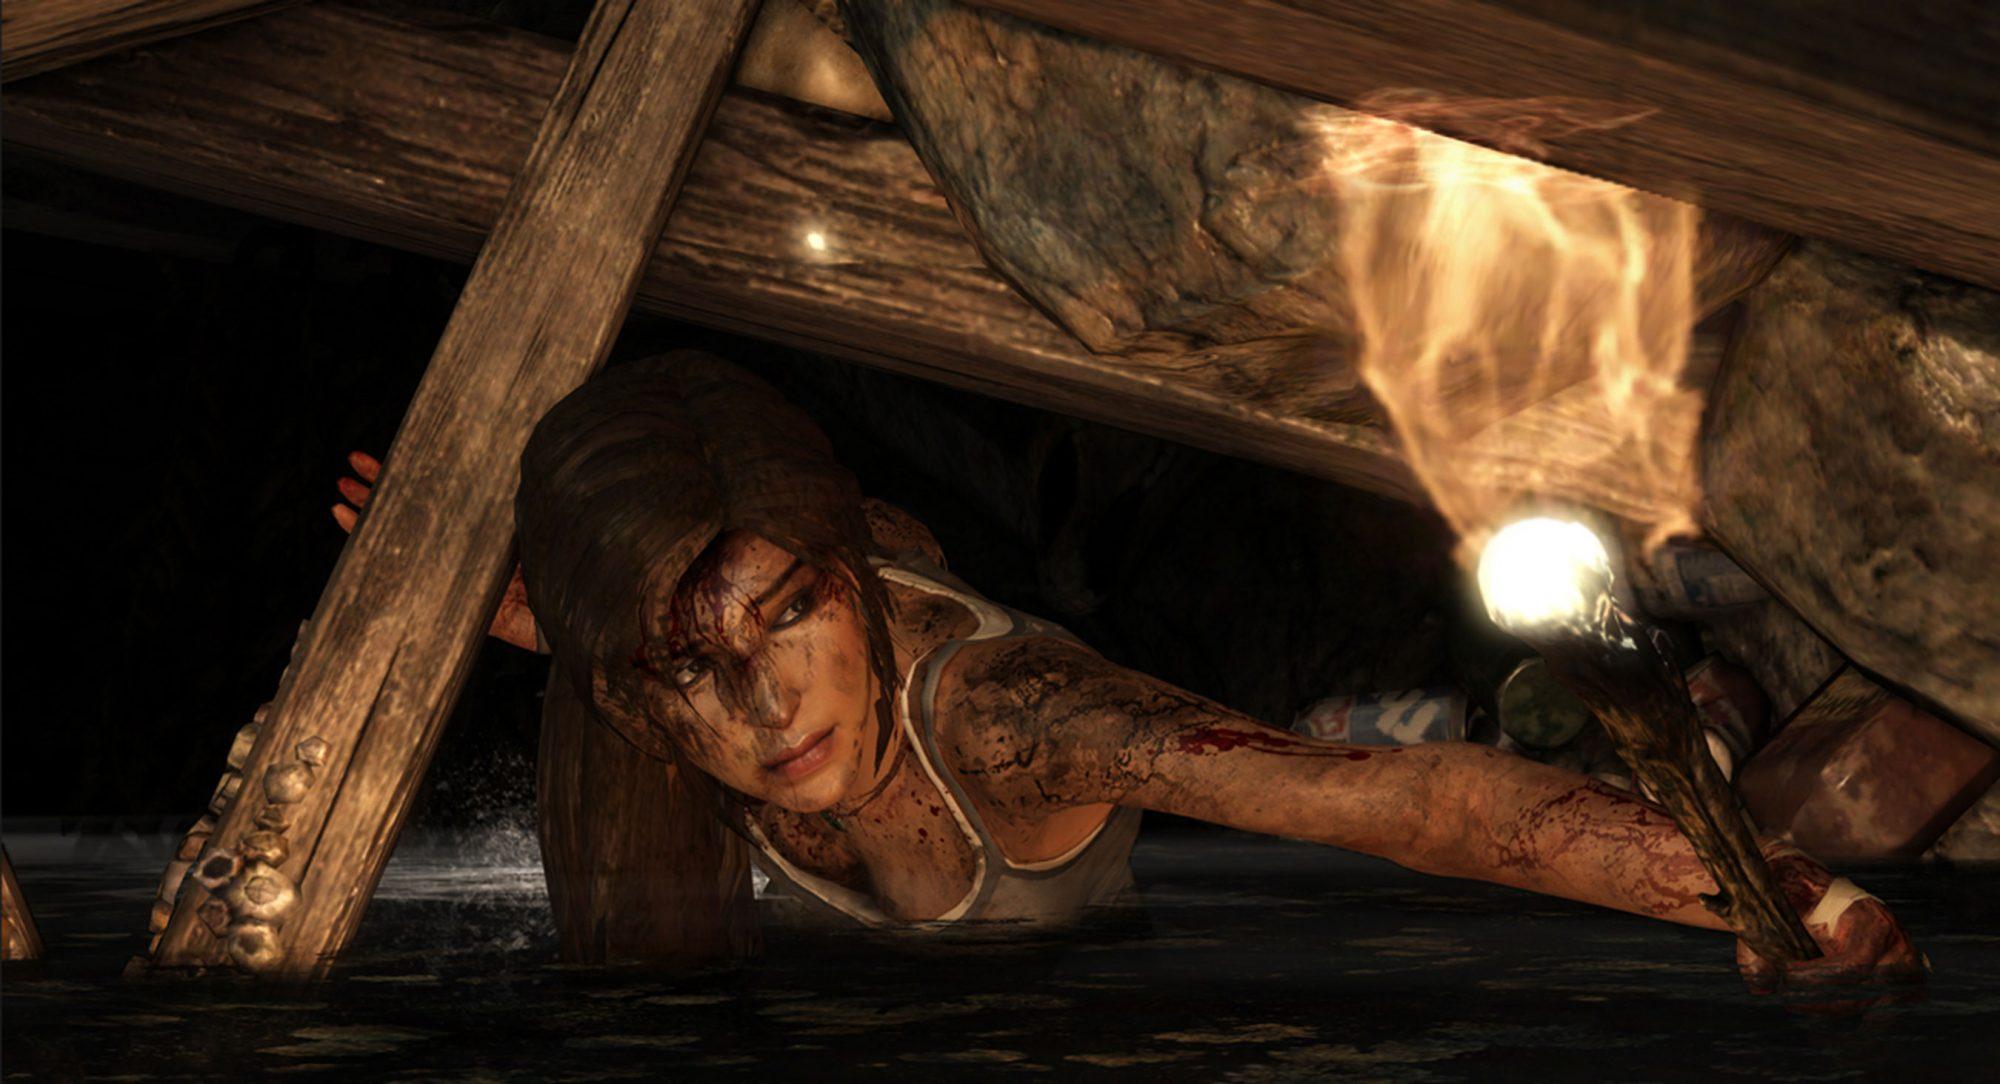 Tomb Raider(video game 2013)